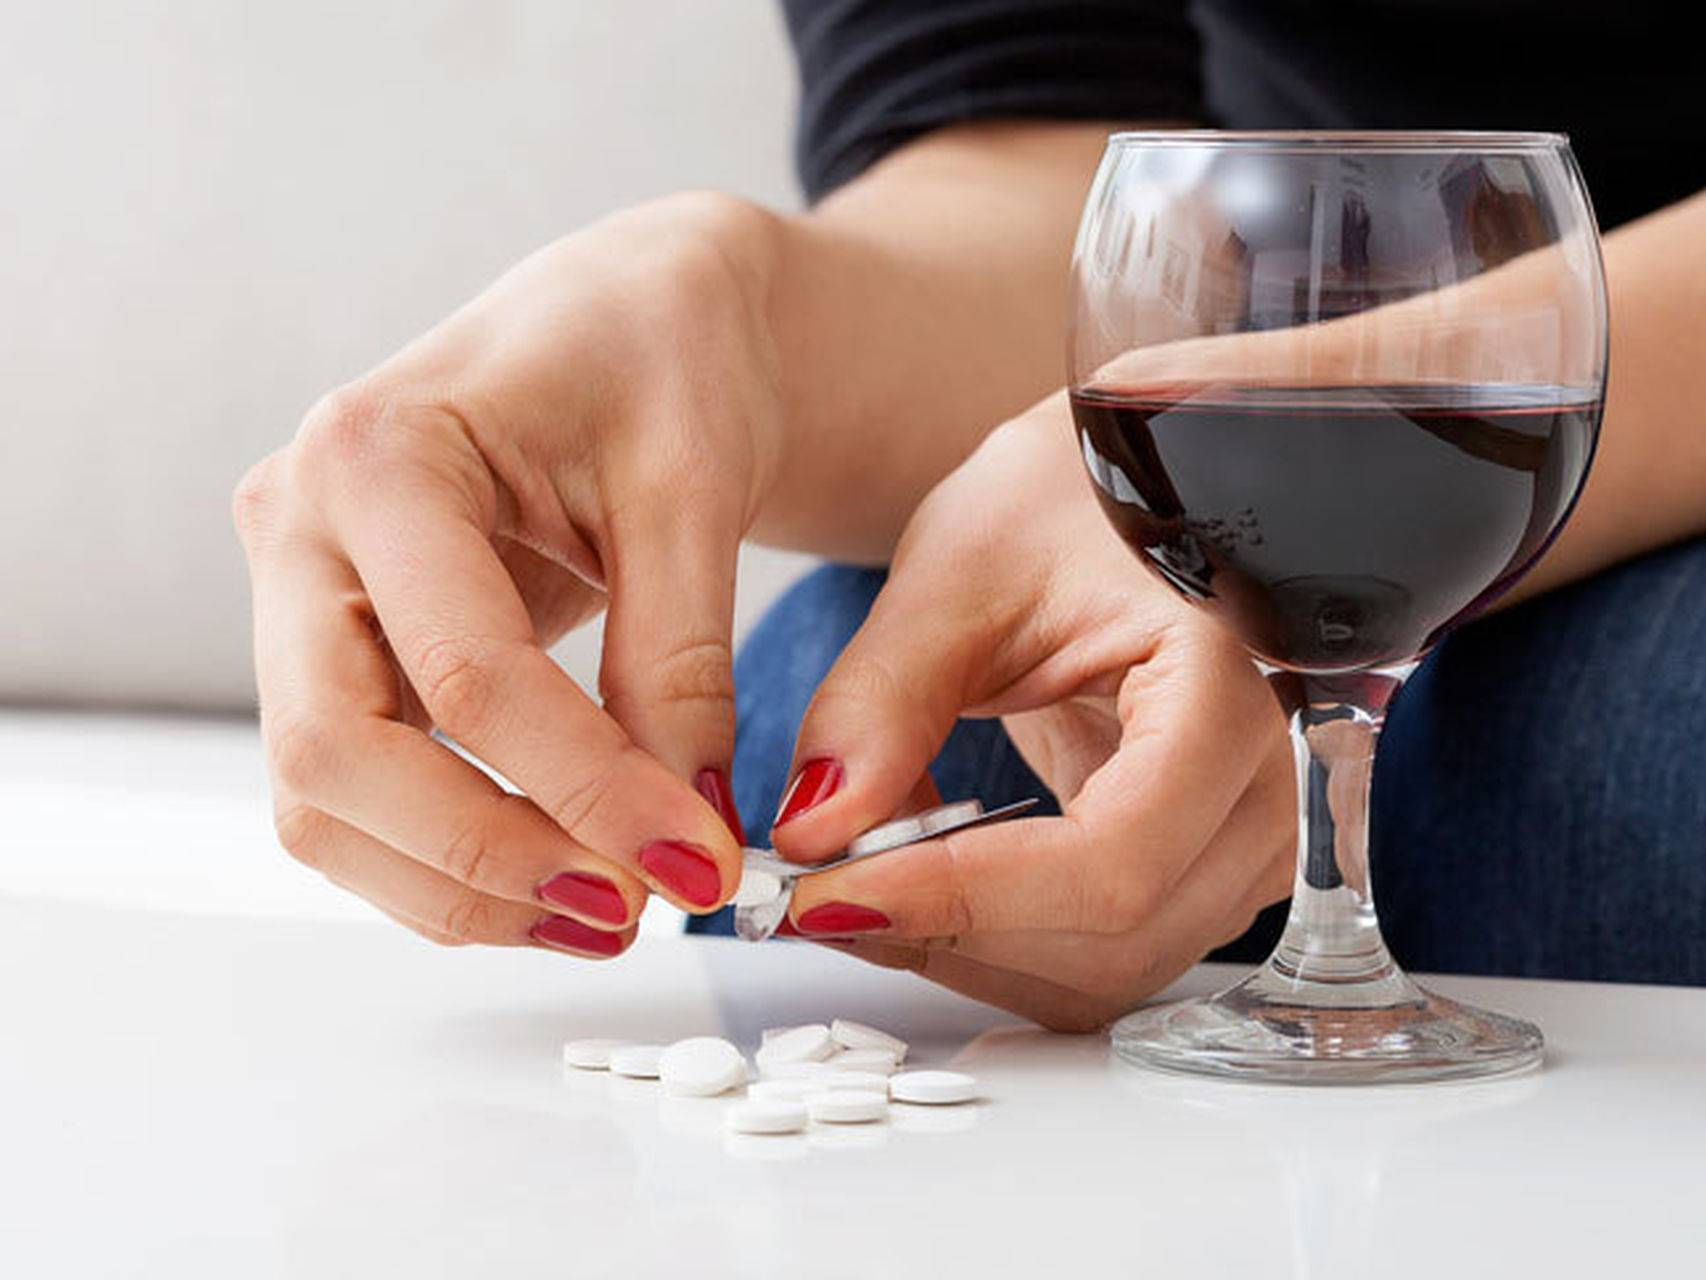 Кардиомагнил и алкоголь